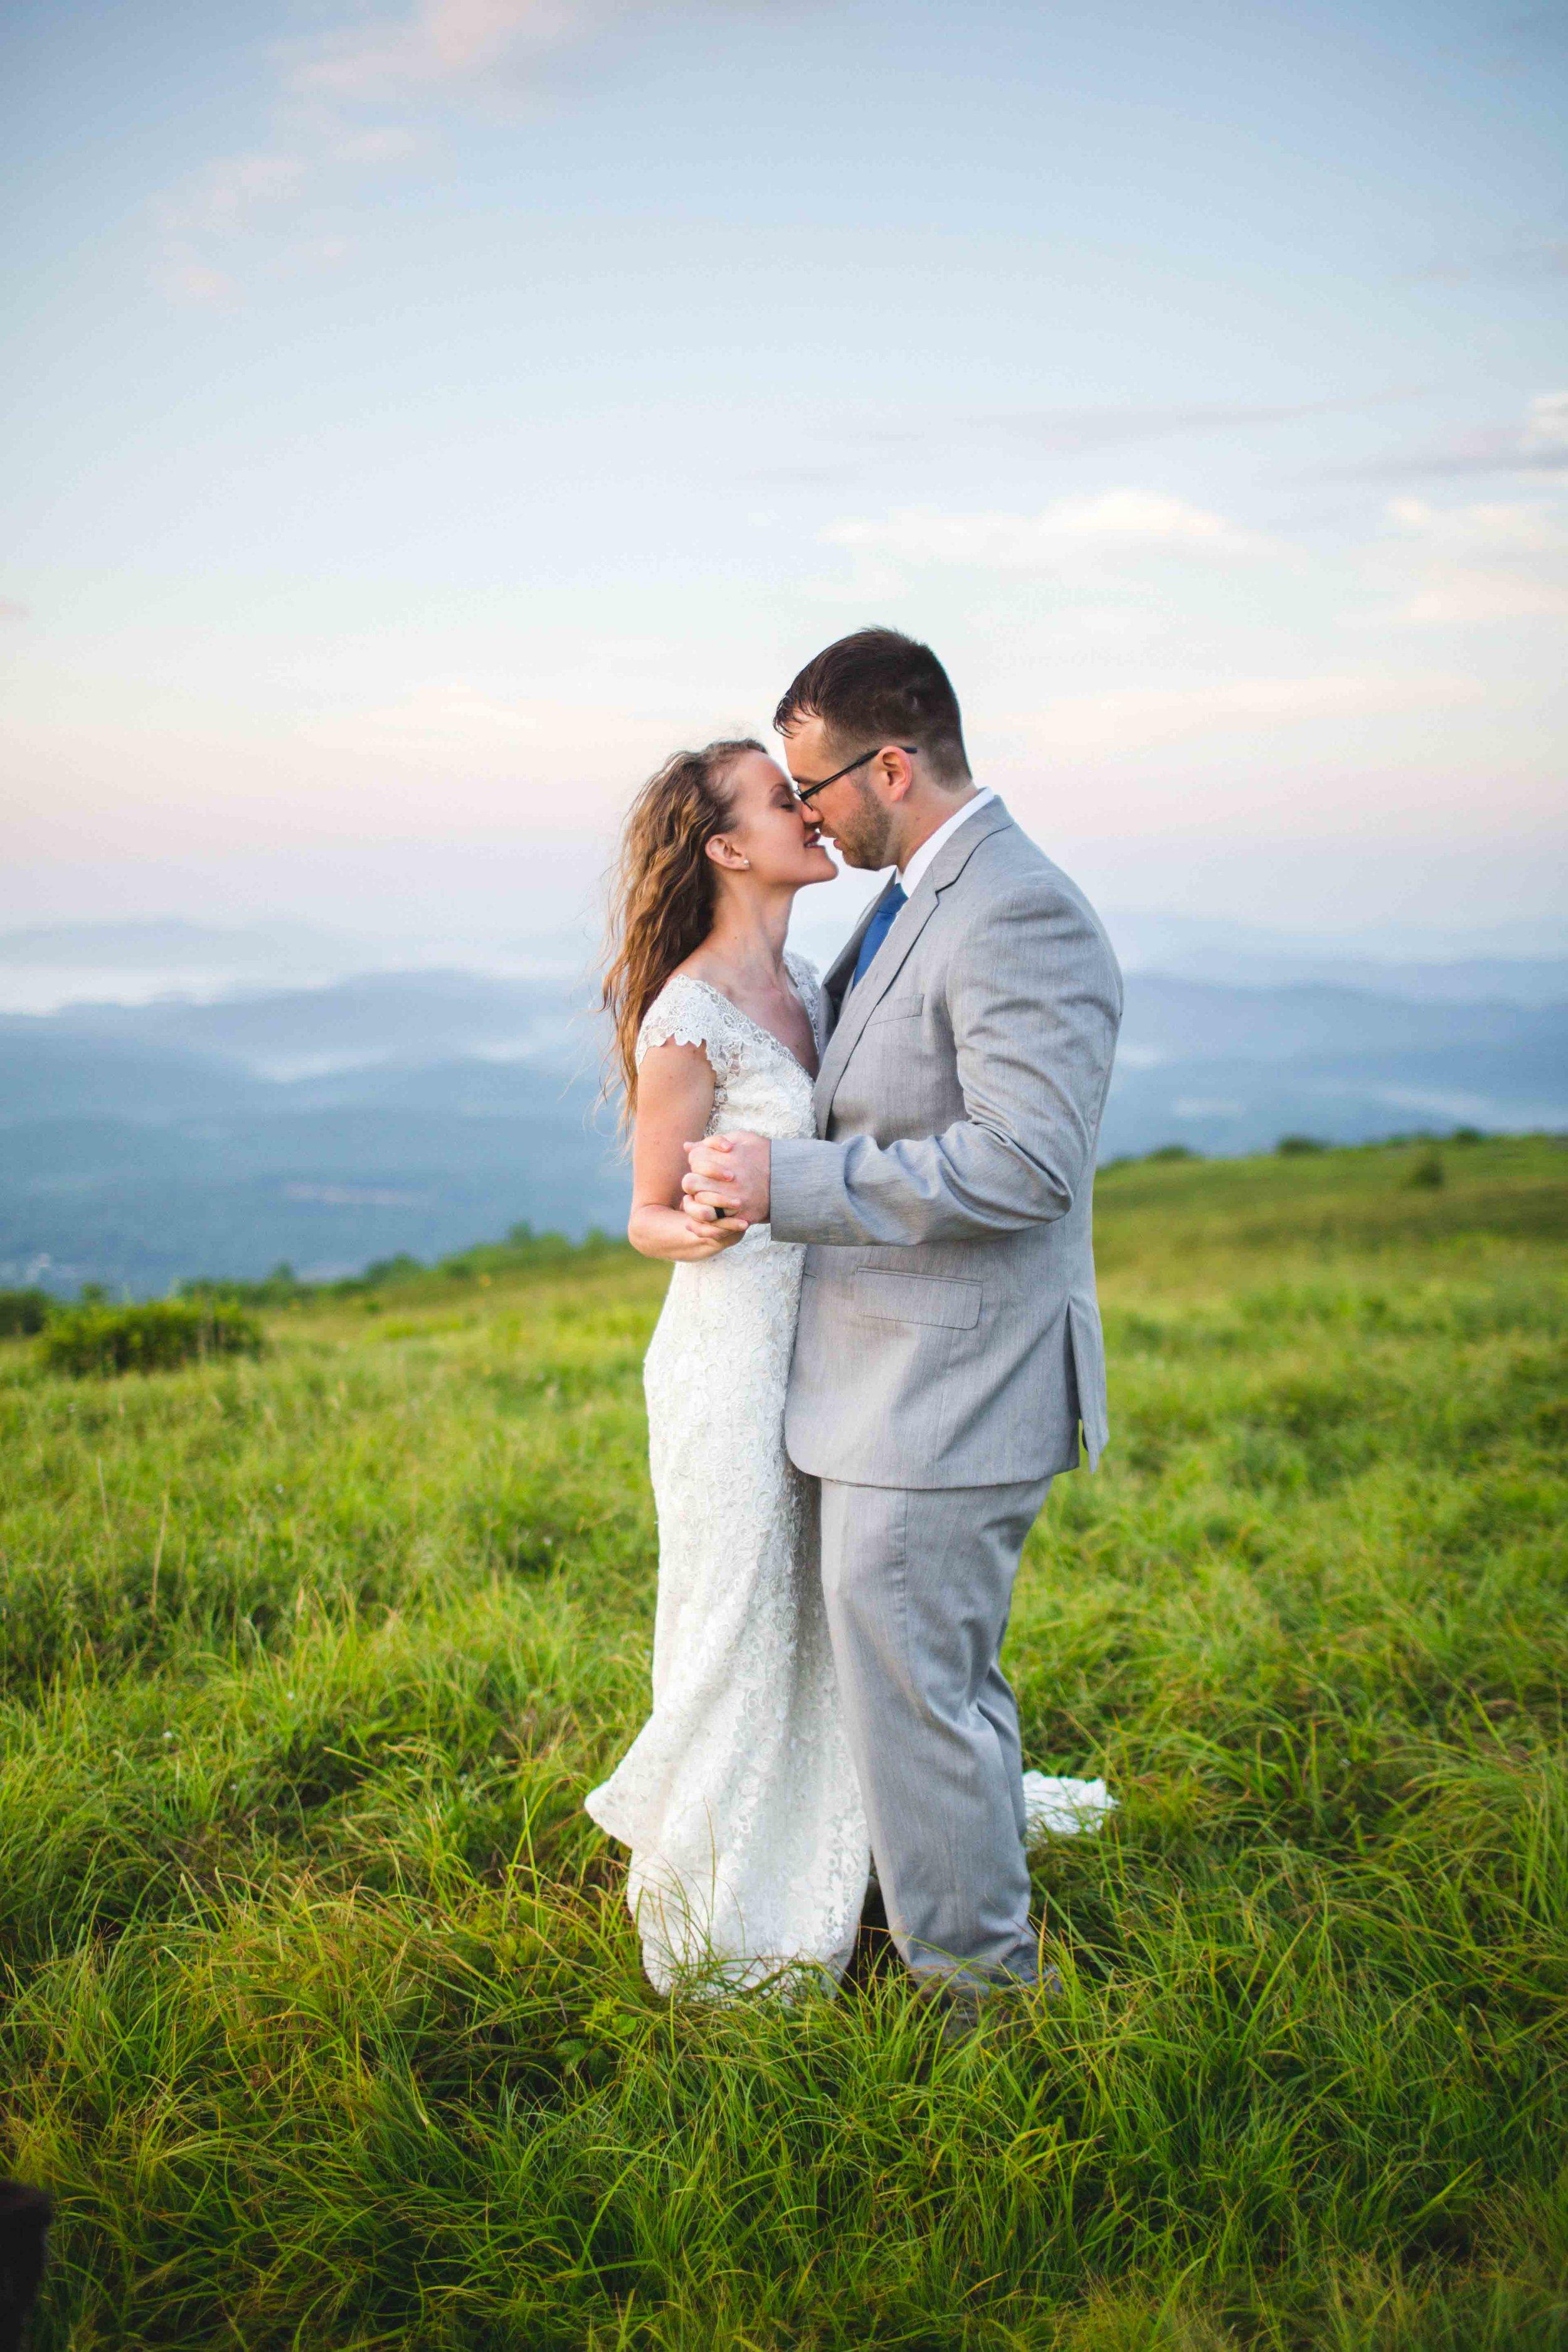 north-carolina-elopement-photographer-38.jpg